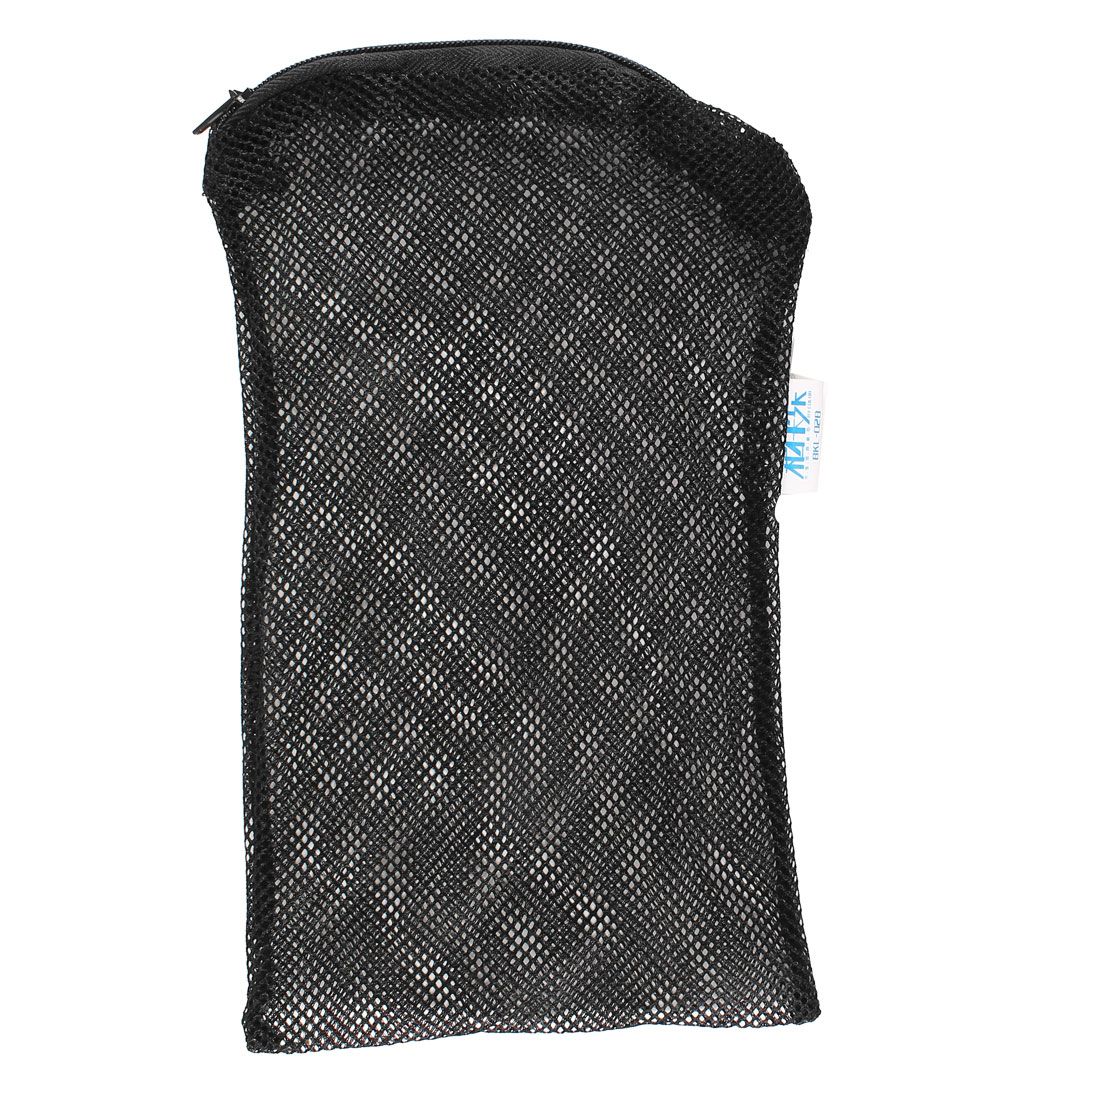 Black Laundry Clothes Zipper Nylon Washing Machine Holder 20cm x 12cm